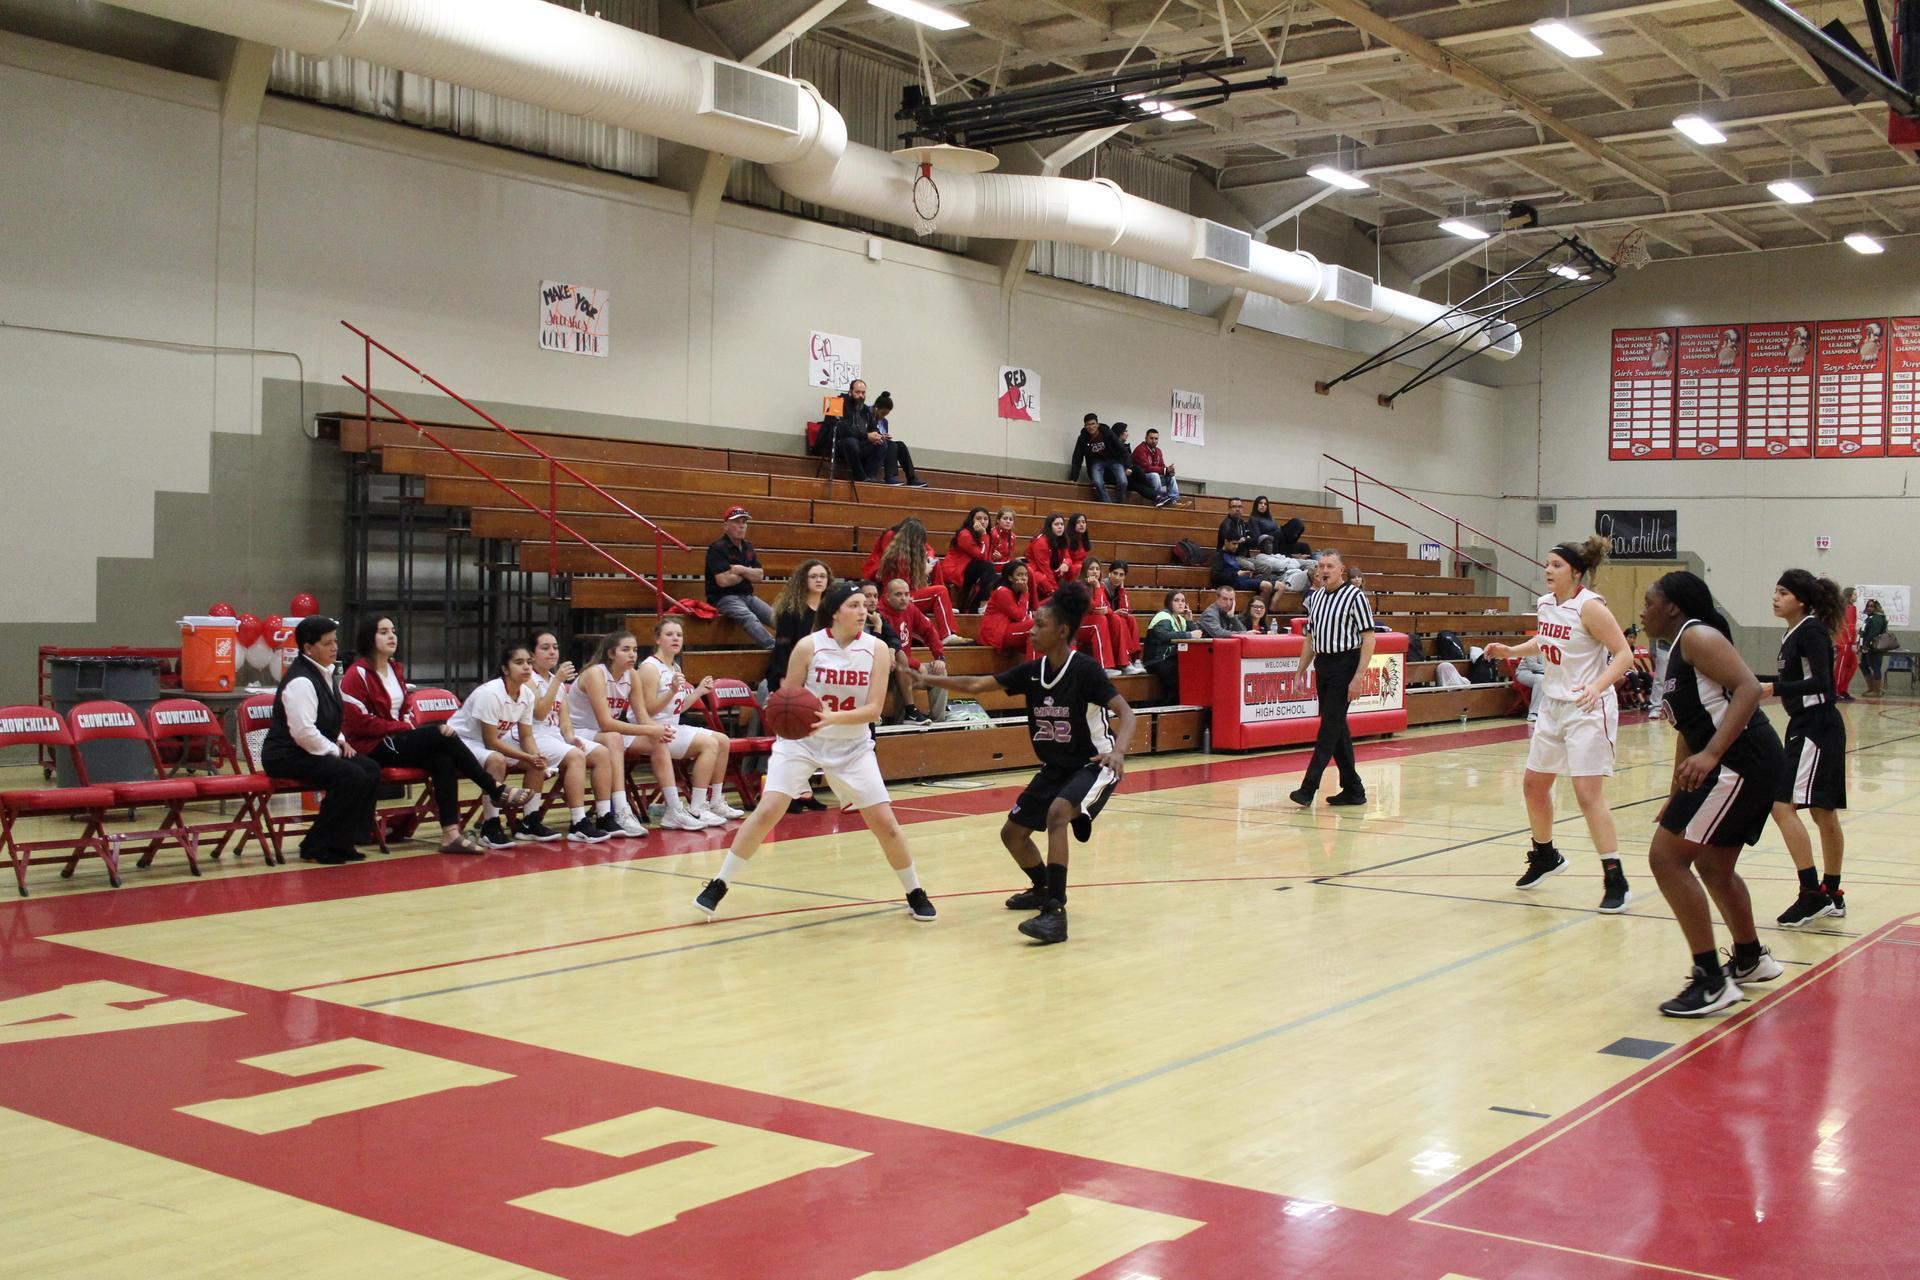 JV Girls Basketball playing against Washington Union